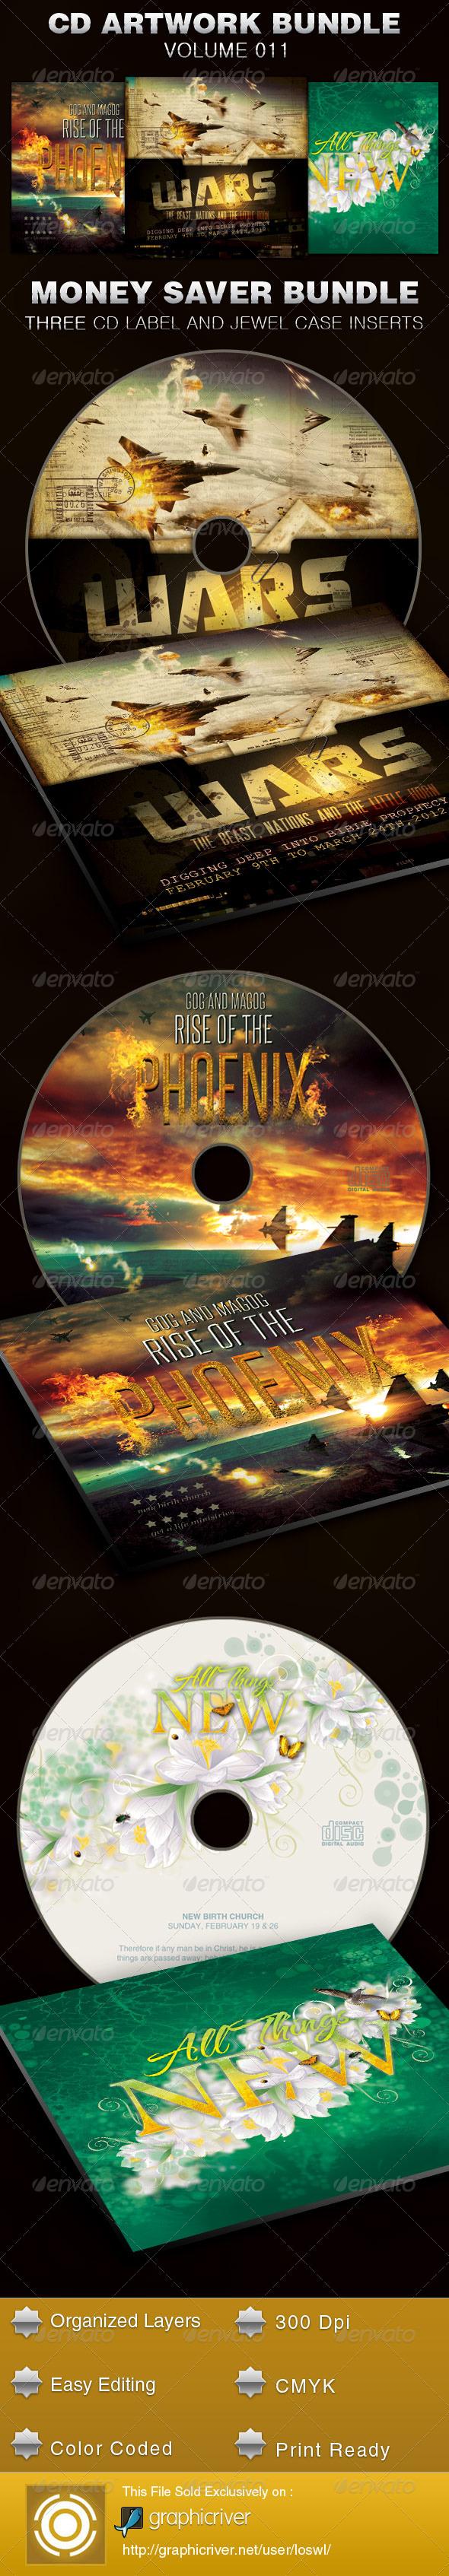 CD Cover Artwork Template Bundle-Vol 011 - CD & DVD Artwork Print Templates